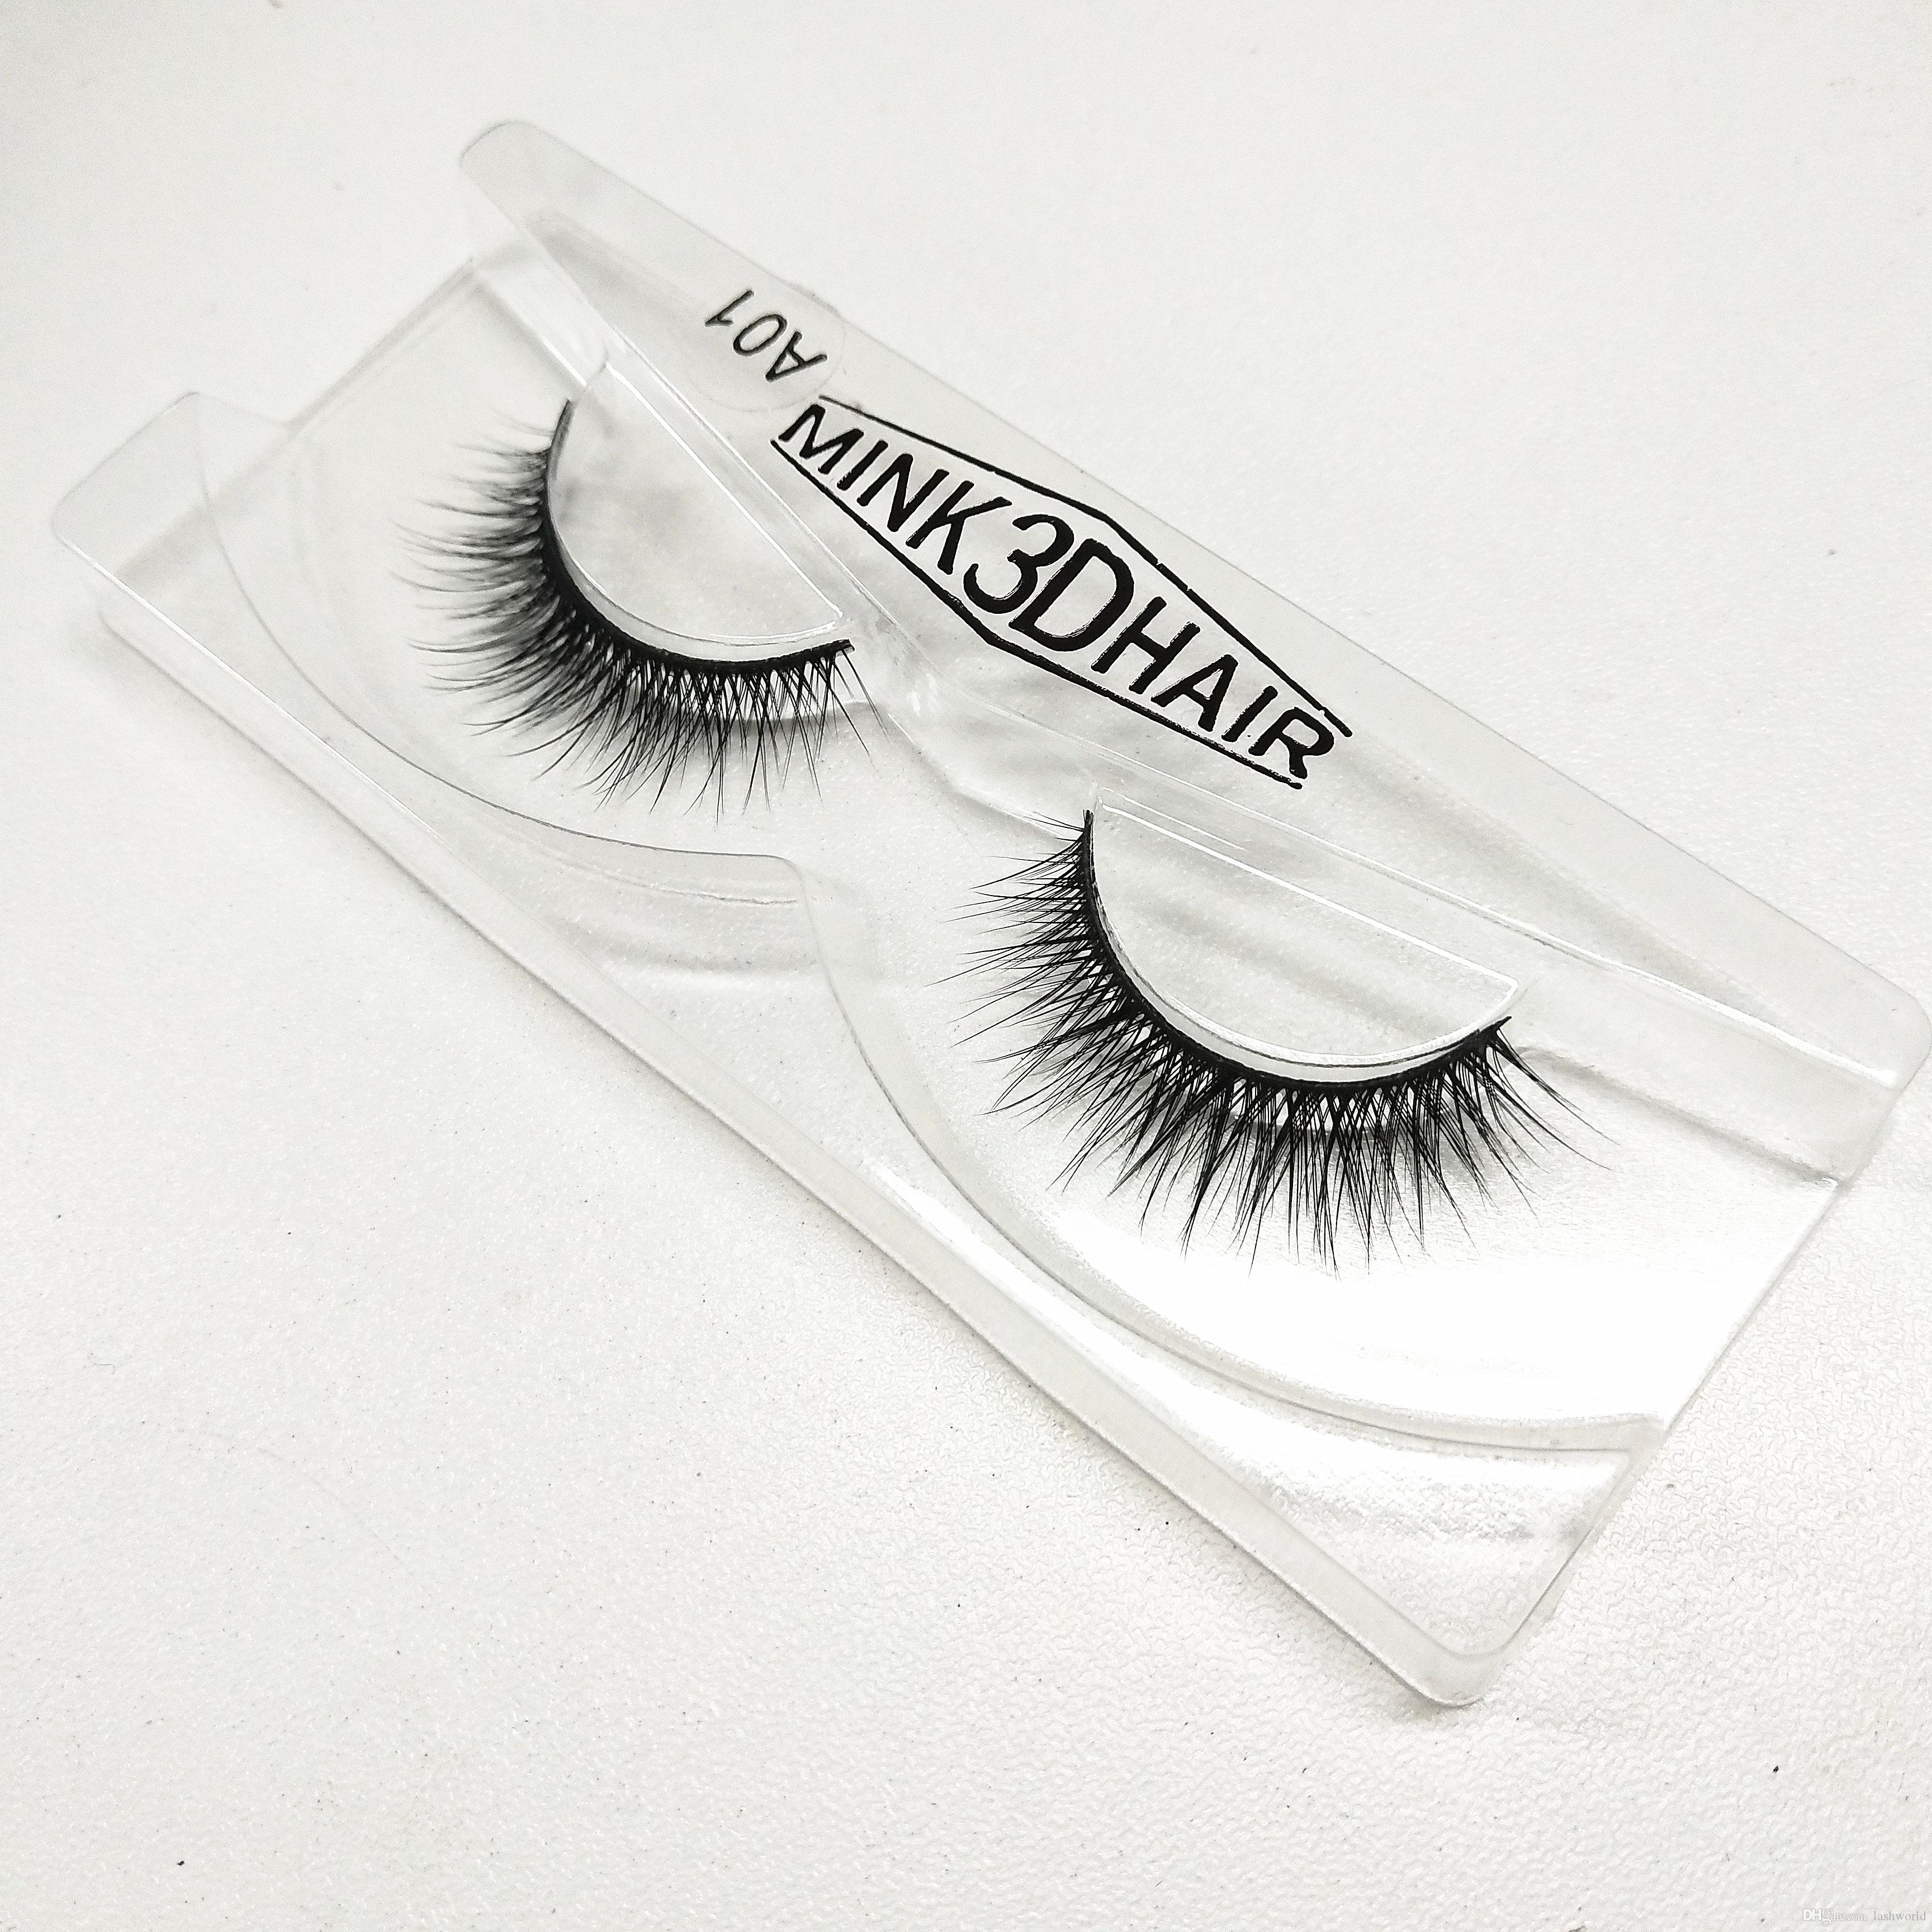 18f0fc18da5 Seashine Wholesale Natural Style 3d Mink Eyelashes False Eyelashes 3d Strip  Lashes 3D Mink Lashes Private Label False Eyelashes Mink Eyelash Mink Lash  3D ...